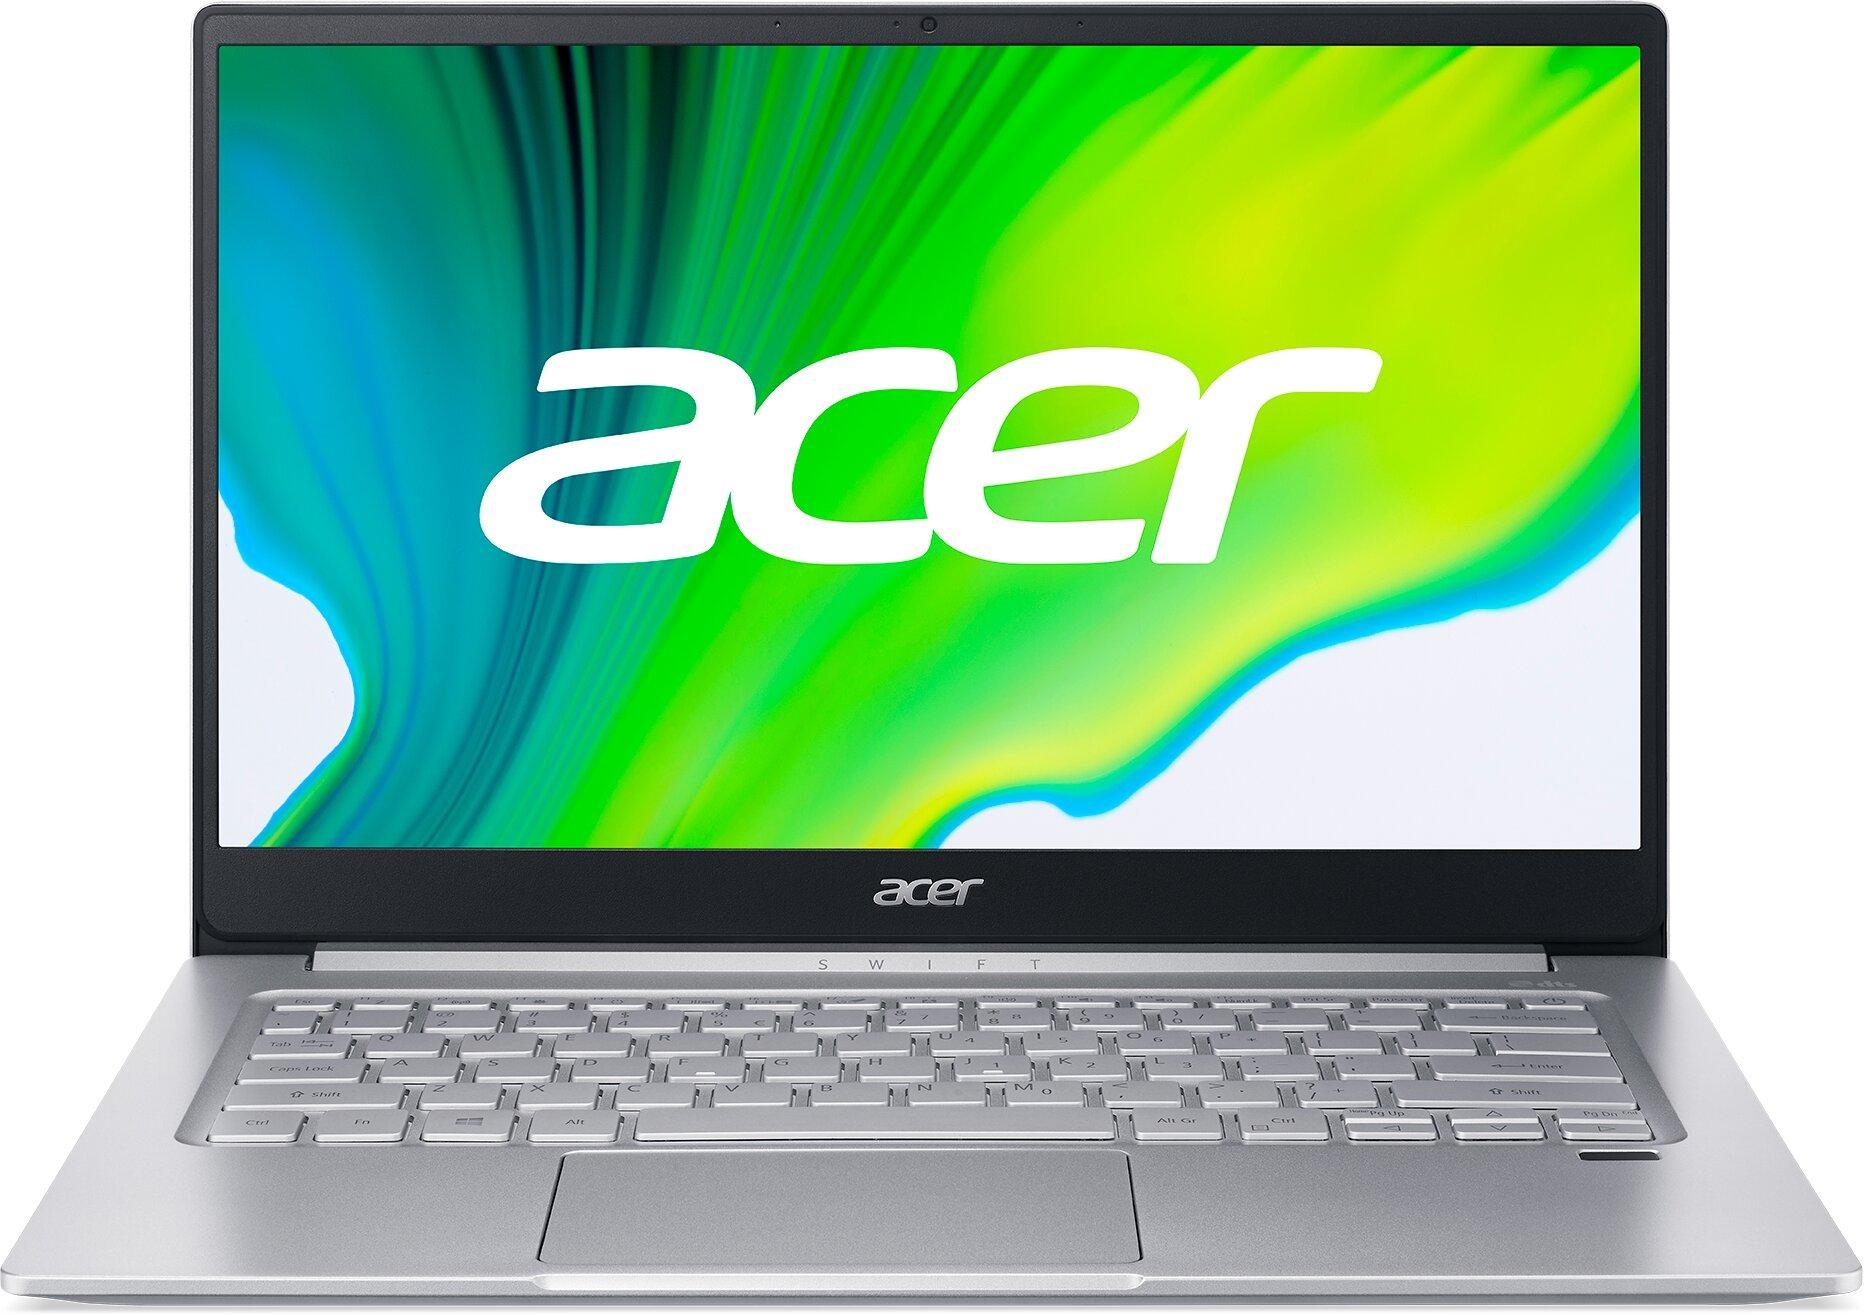 Acer Swift 3 SF314-59-52A6